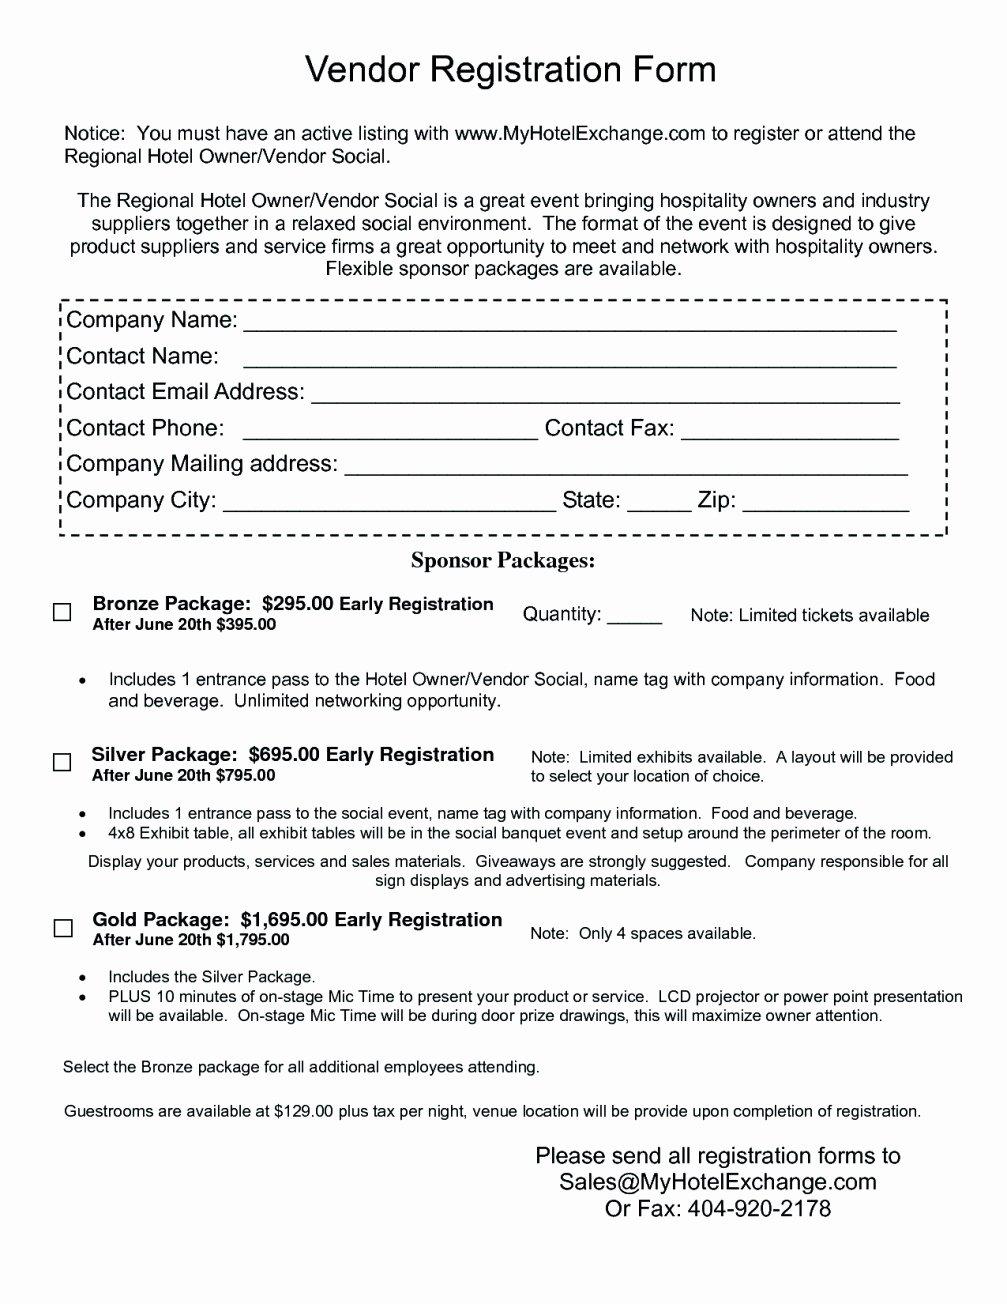 Vendor Registration form Template Luxury 12 13 Vendor Sign In Sheet Template